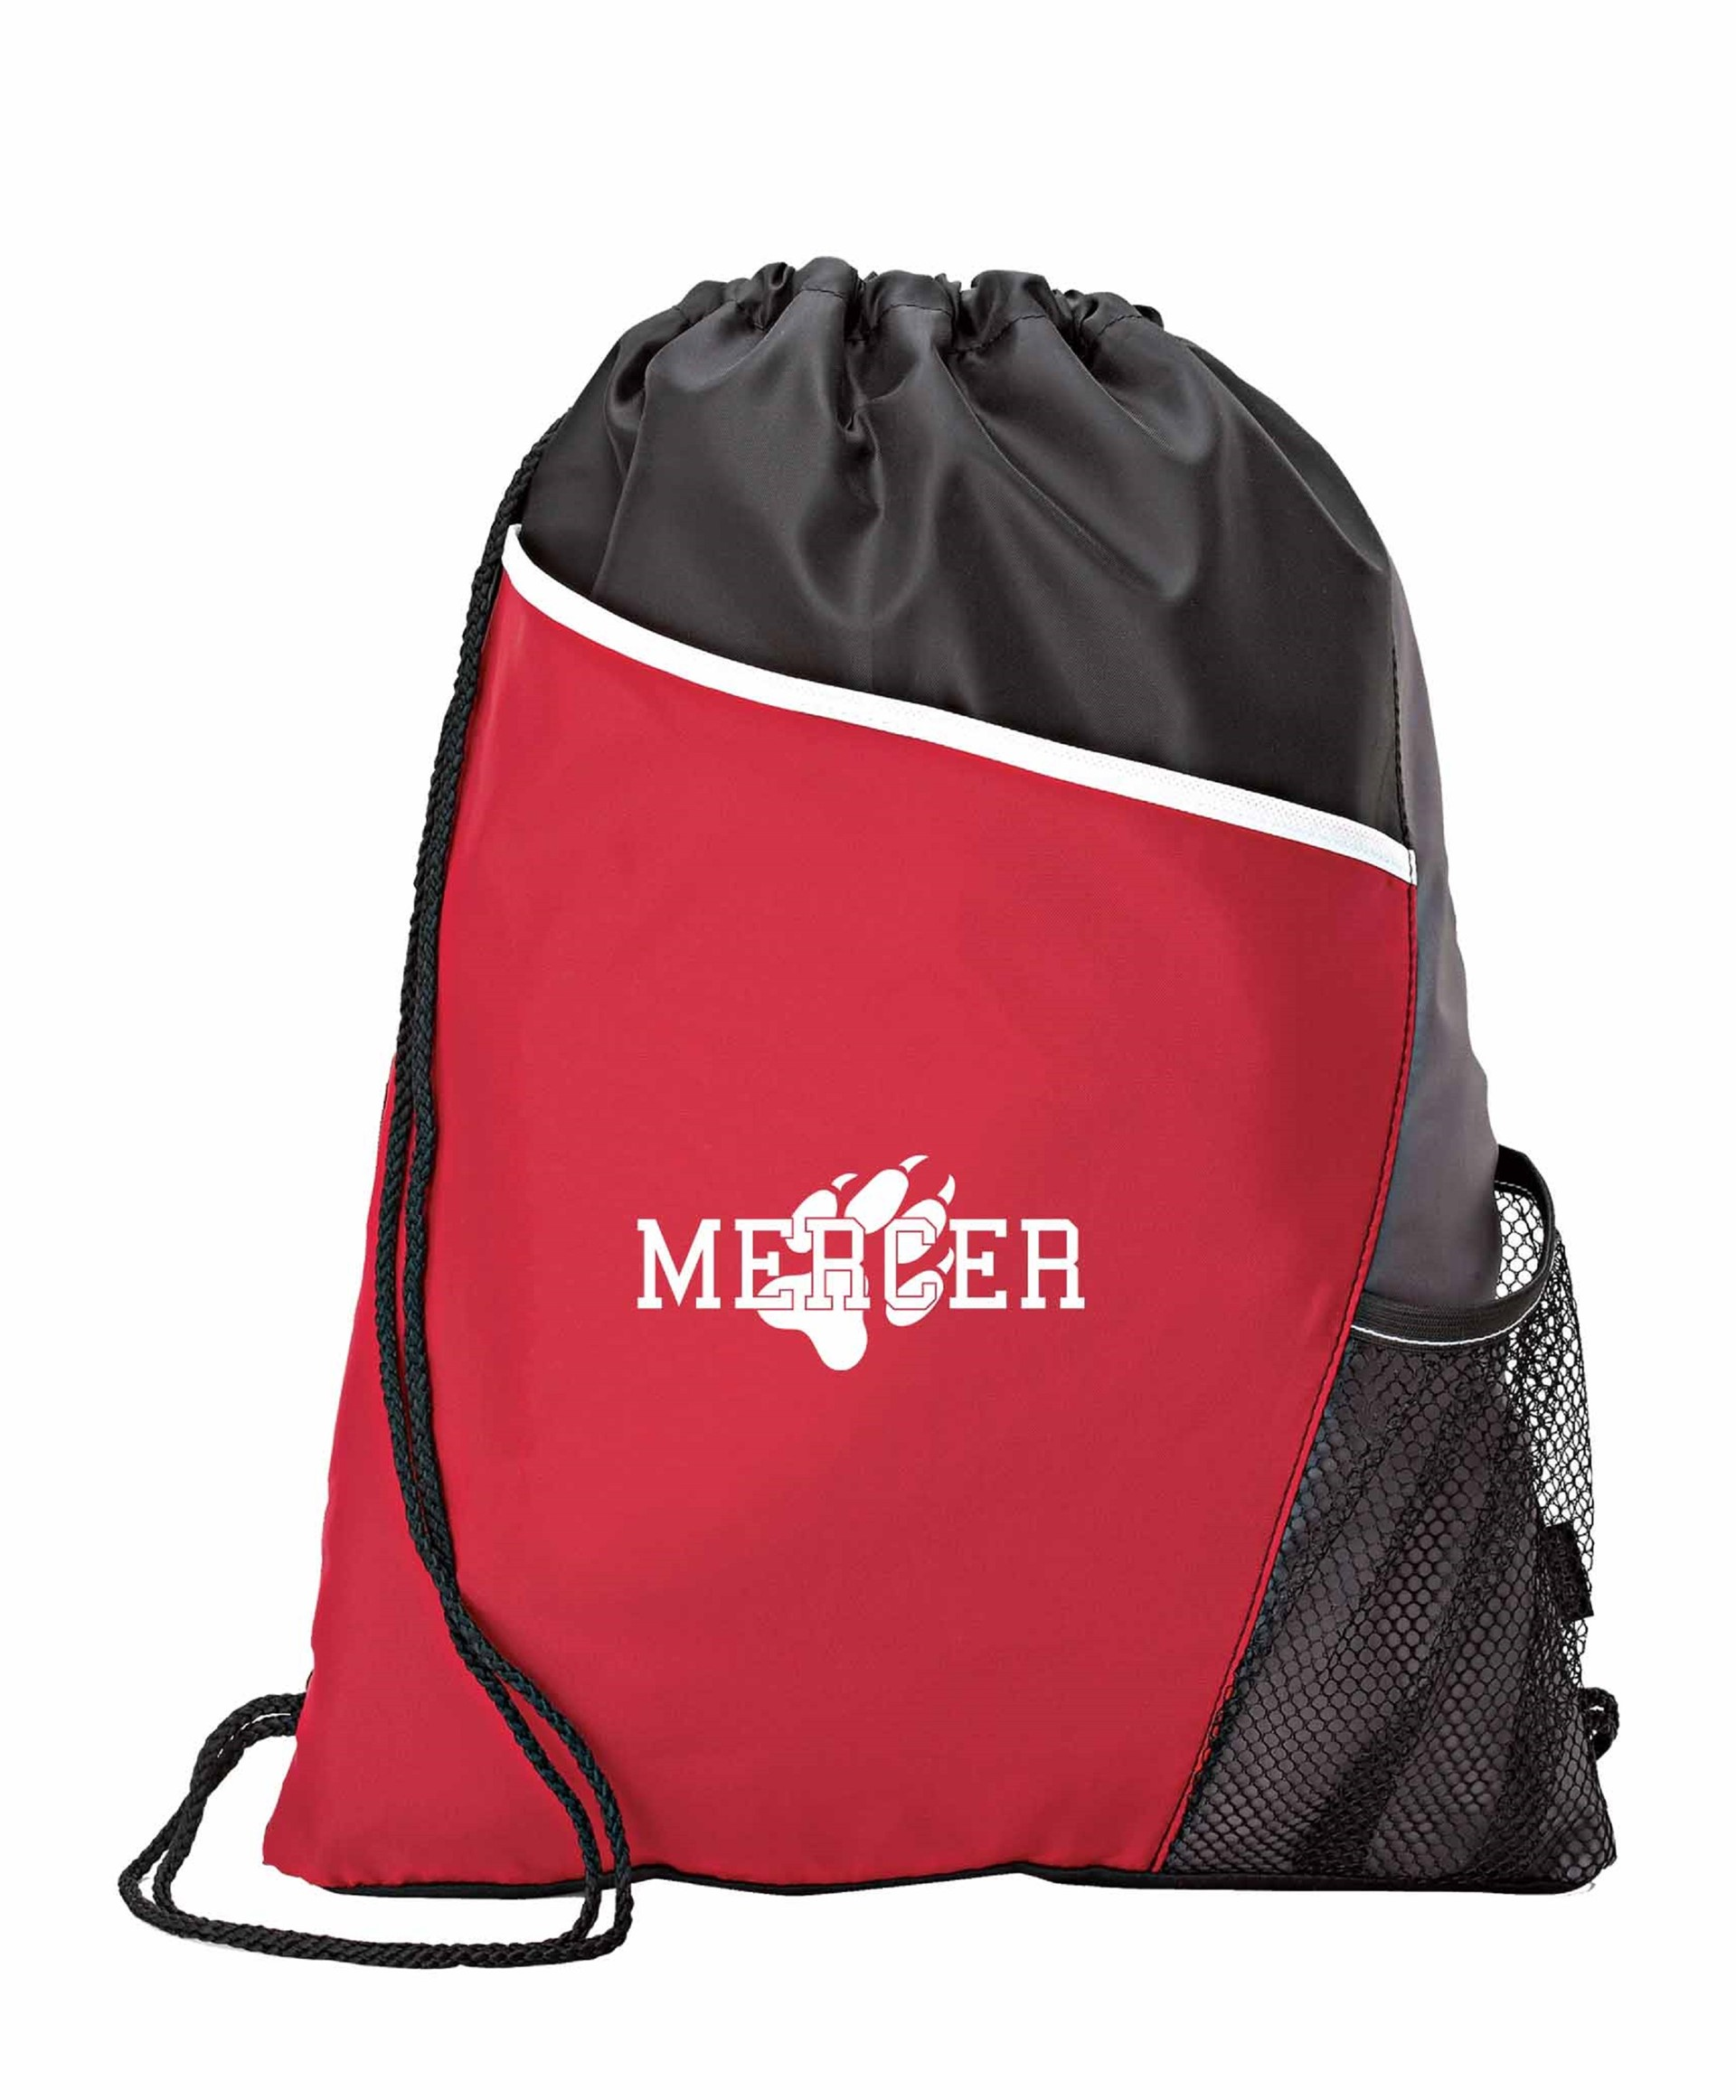 Cinch Backpack $5